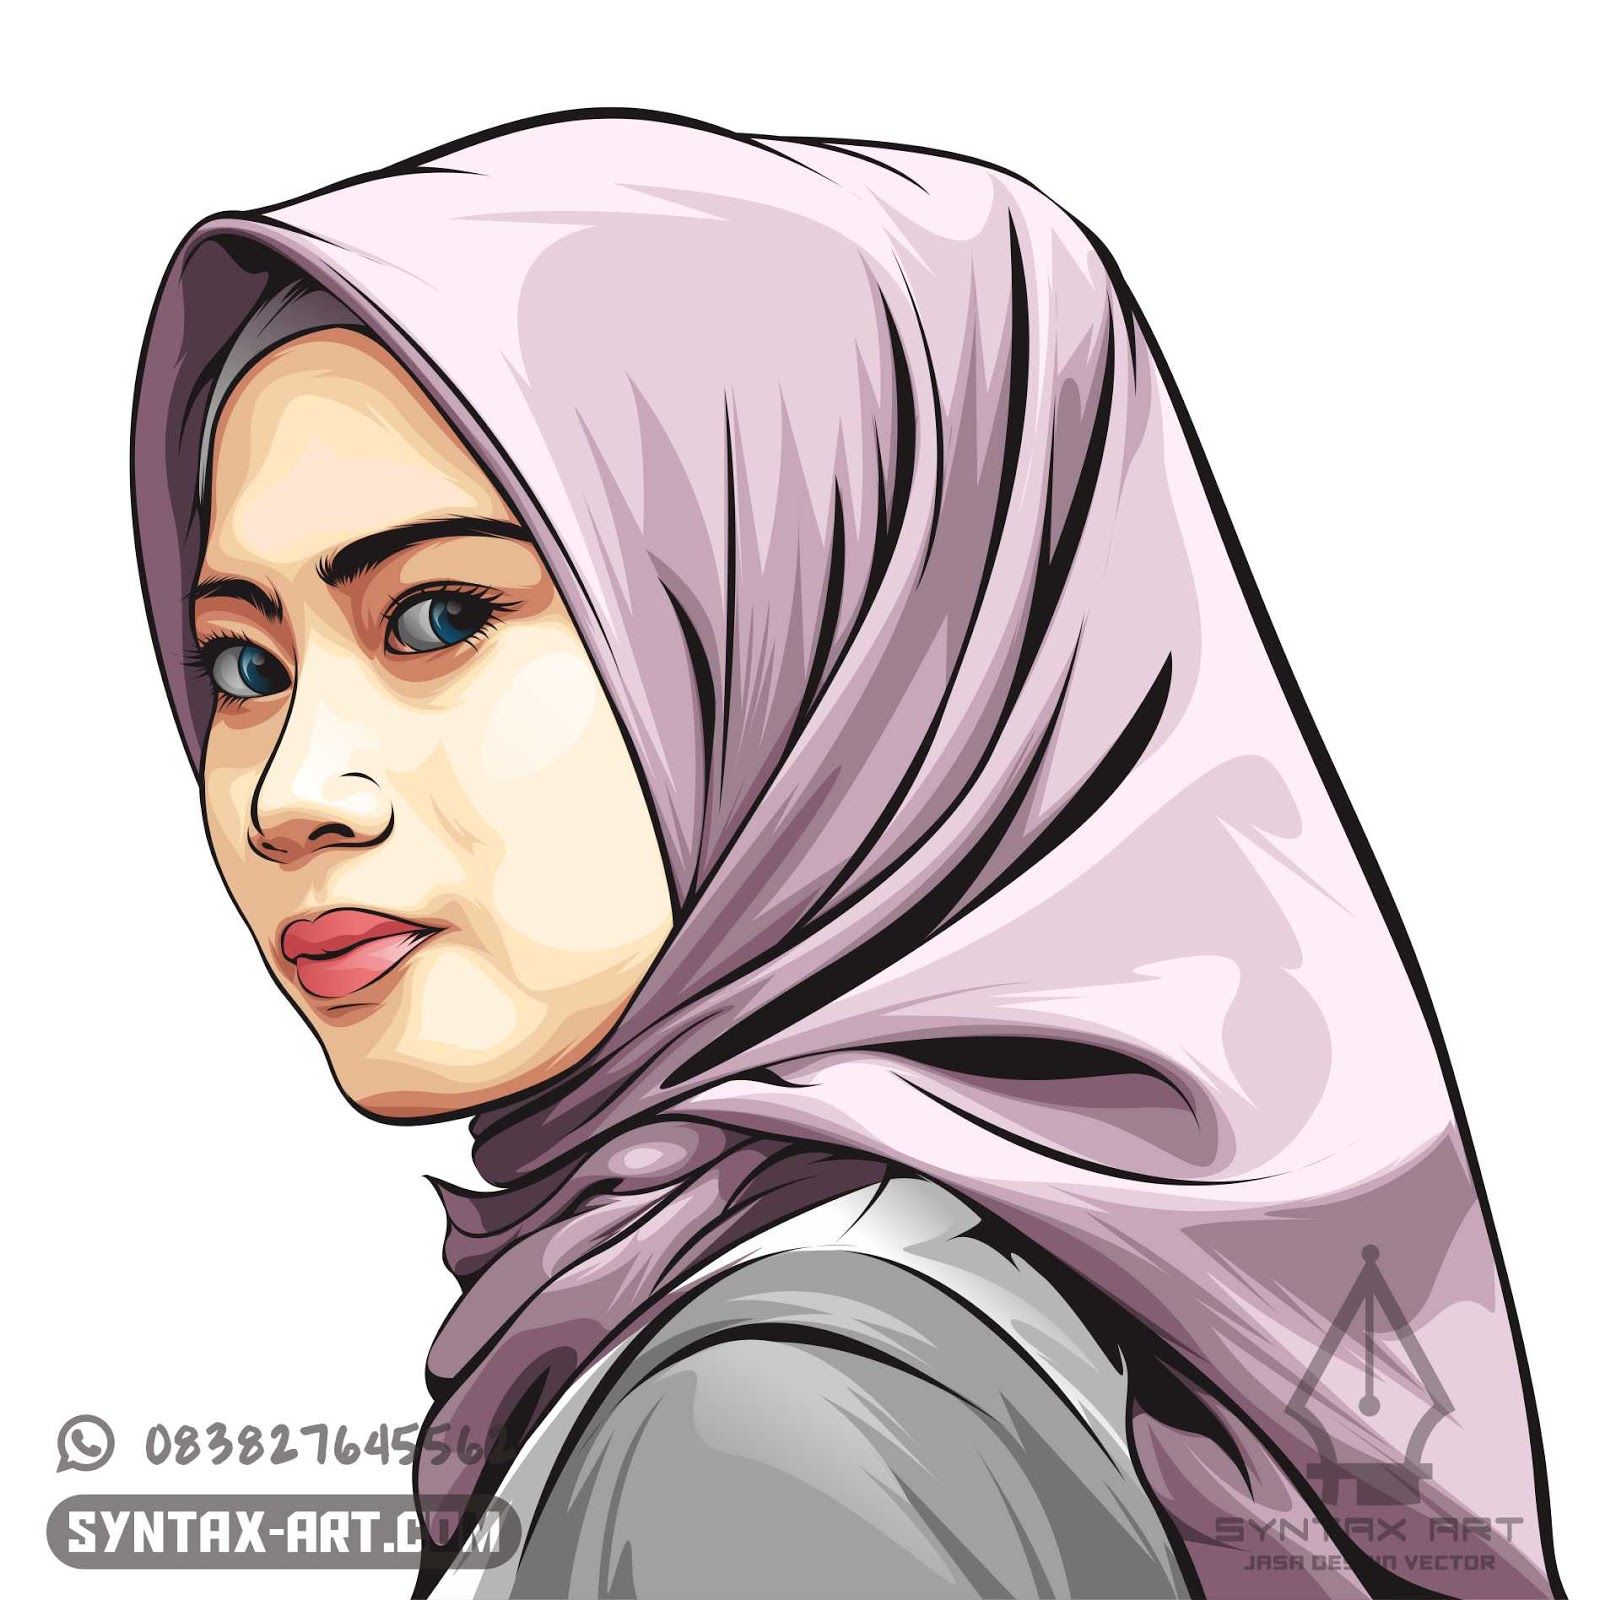 images?q=tbn:ANd9GcQh_l3eQ5xwiPy07kGEXjmjgmBKBRB7H2mRxCGhv1tFWg5c_mWT Ideas For Vector Art From Photo @koolgadgetz.com.info